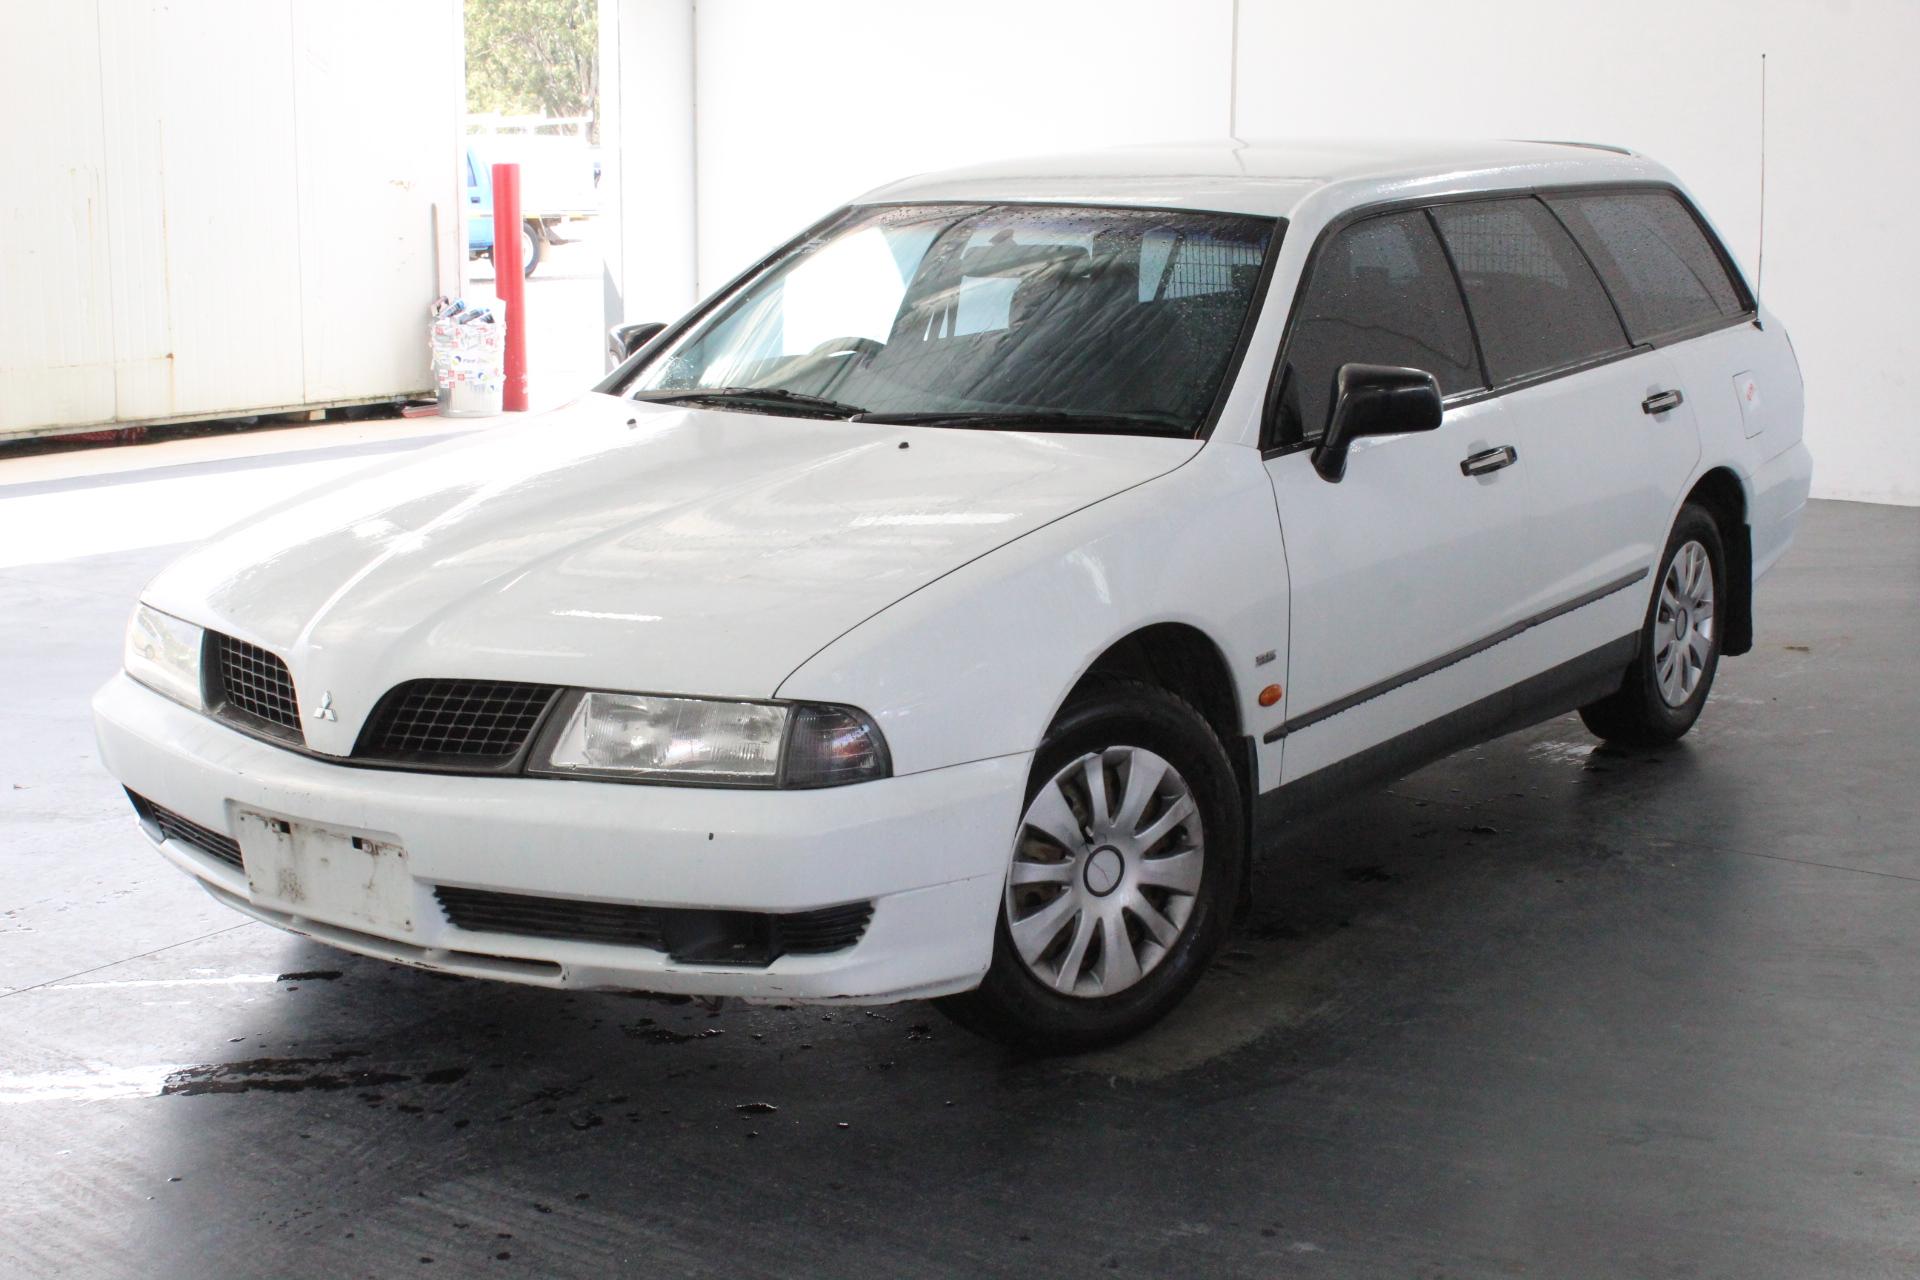 2001 Mitsubishi Magna Executive TJ II Automatic Wagon